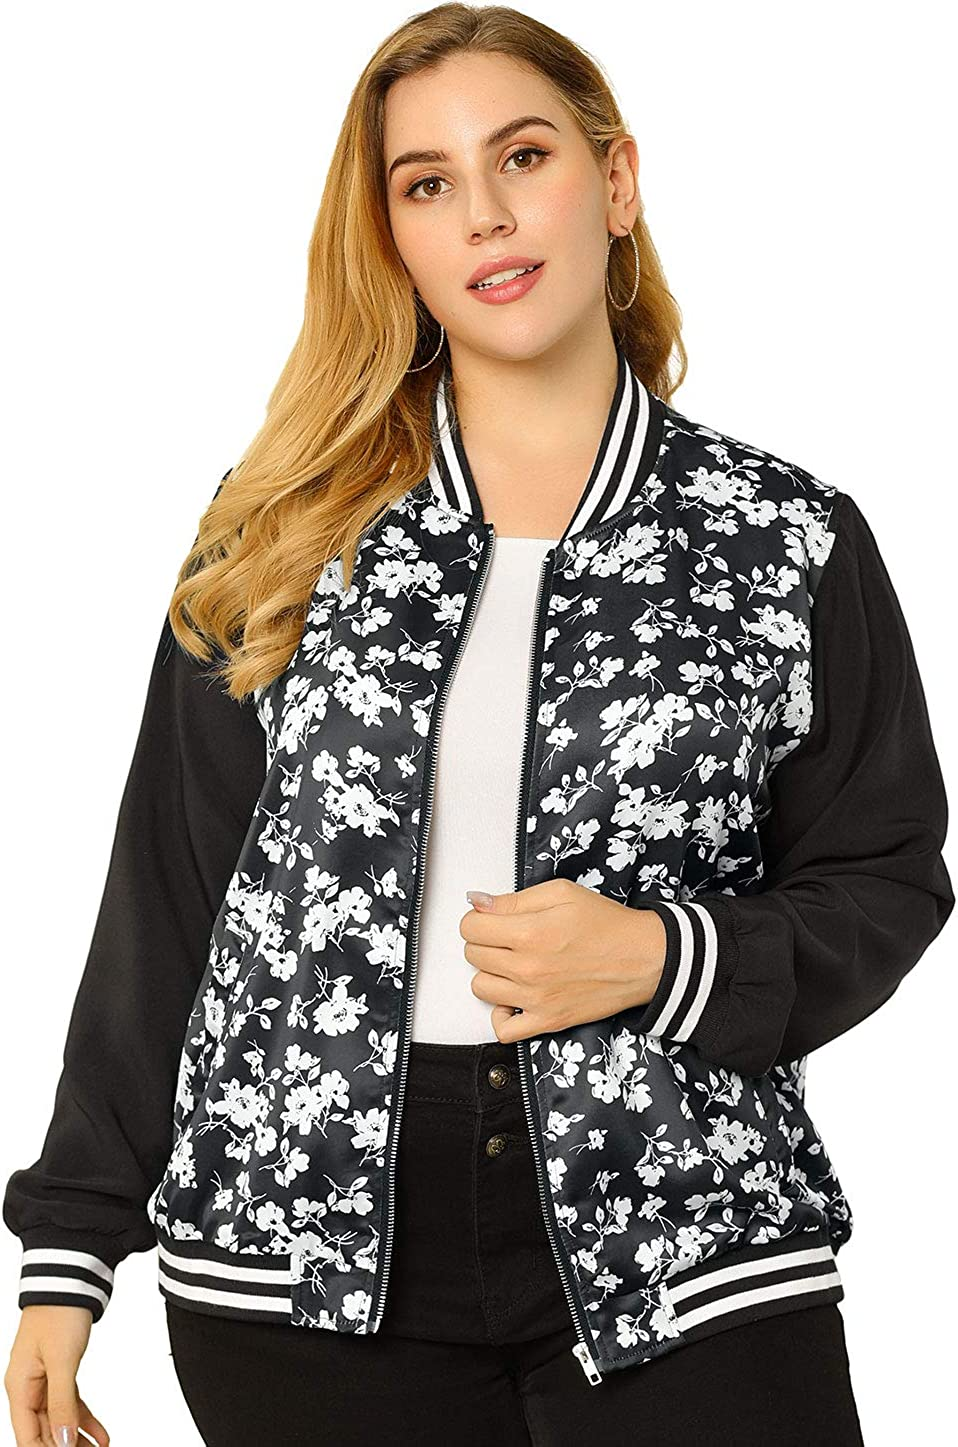 Agnes Orinda Women's Plus Size Jackets Contrast Color Lightweight Floral Bomber Jacket